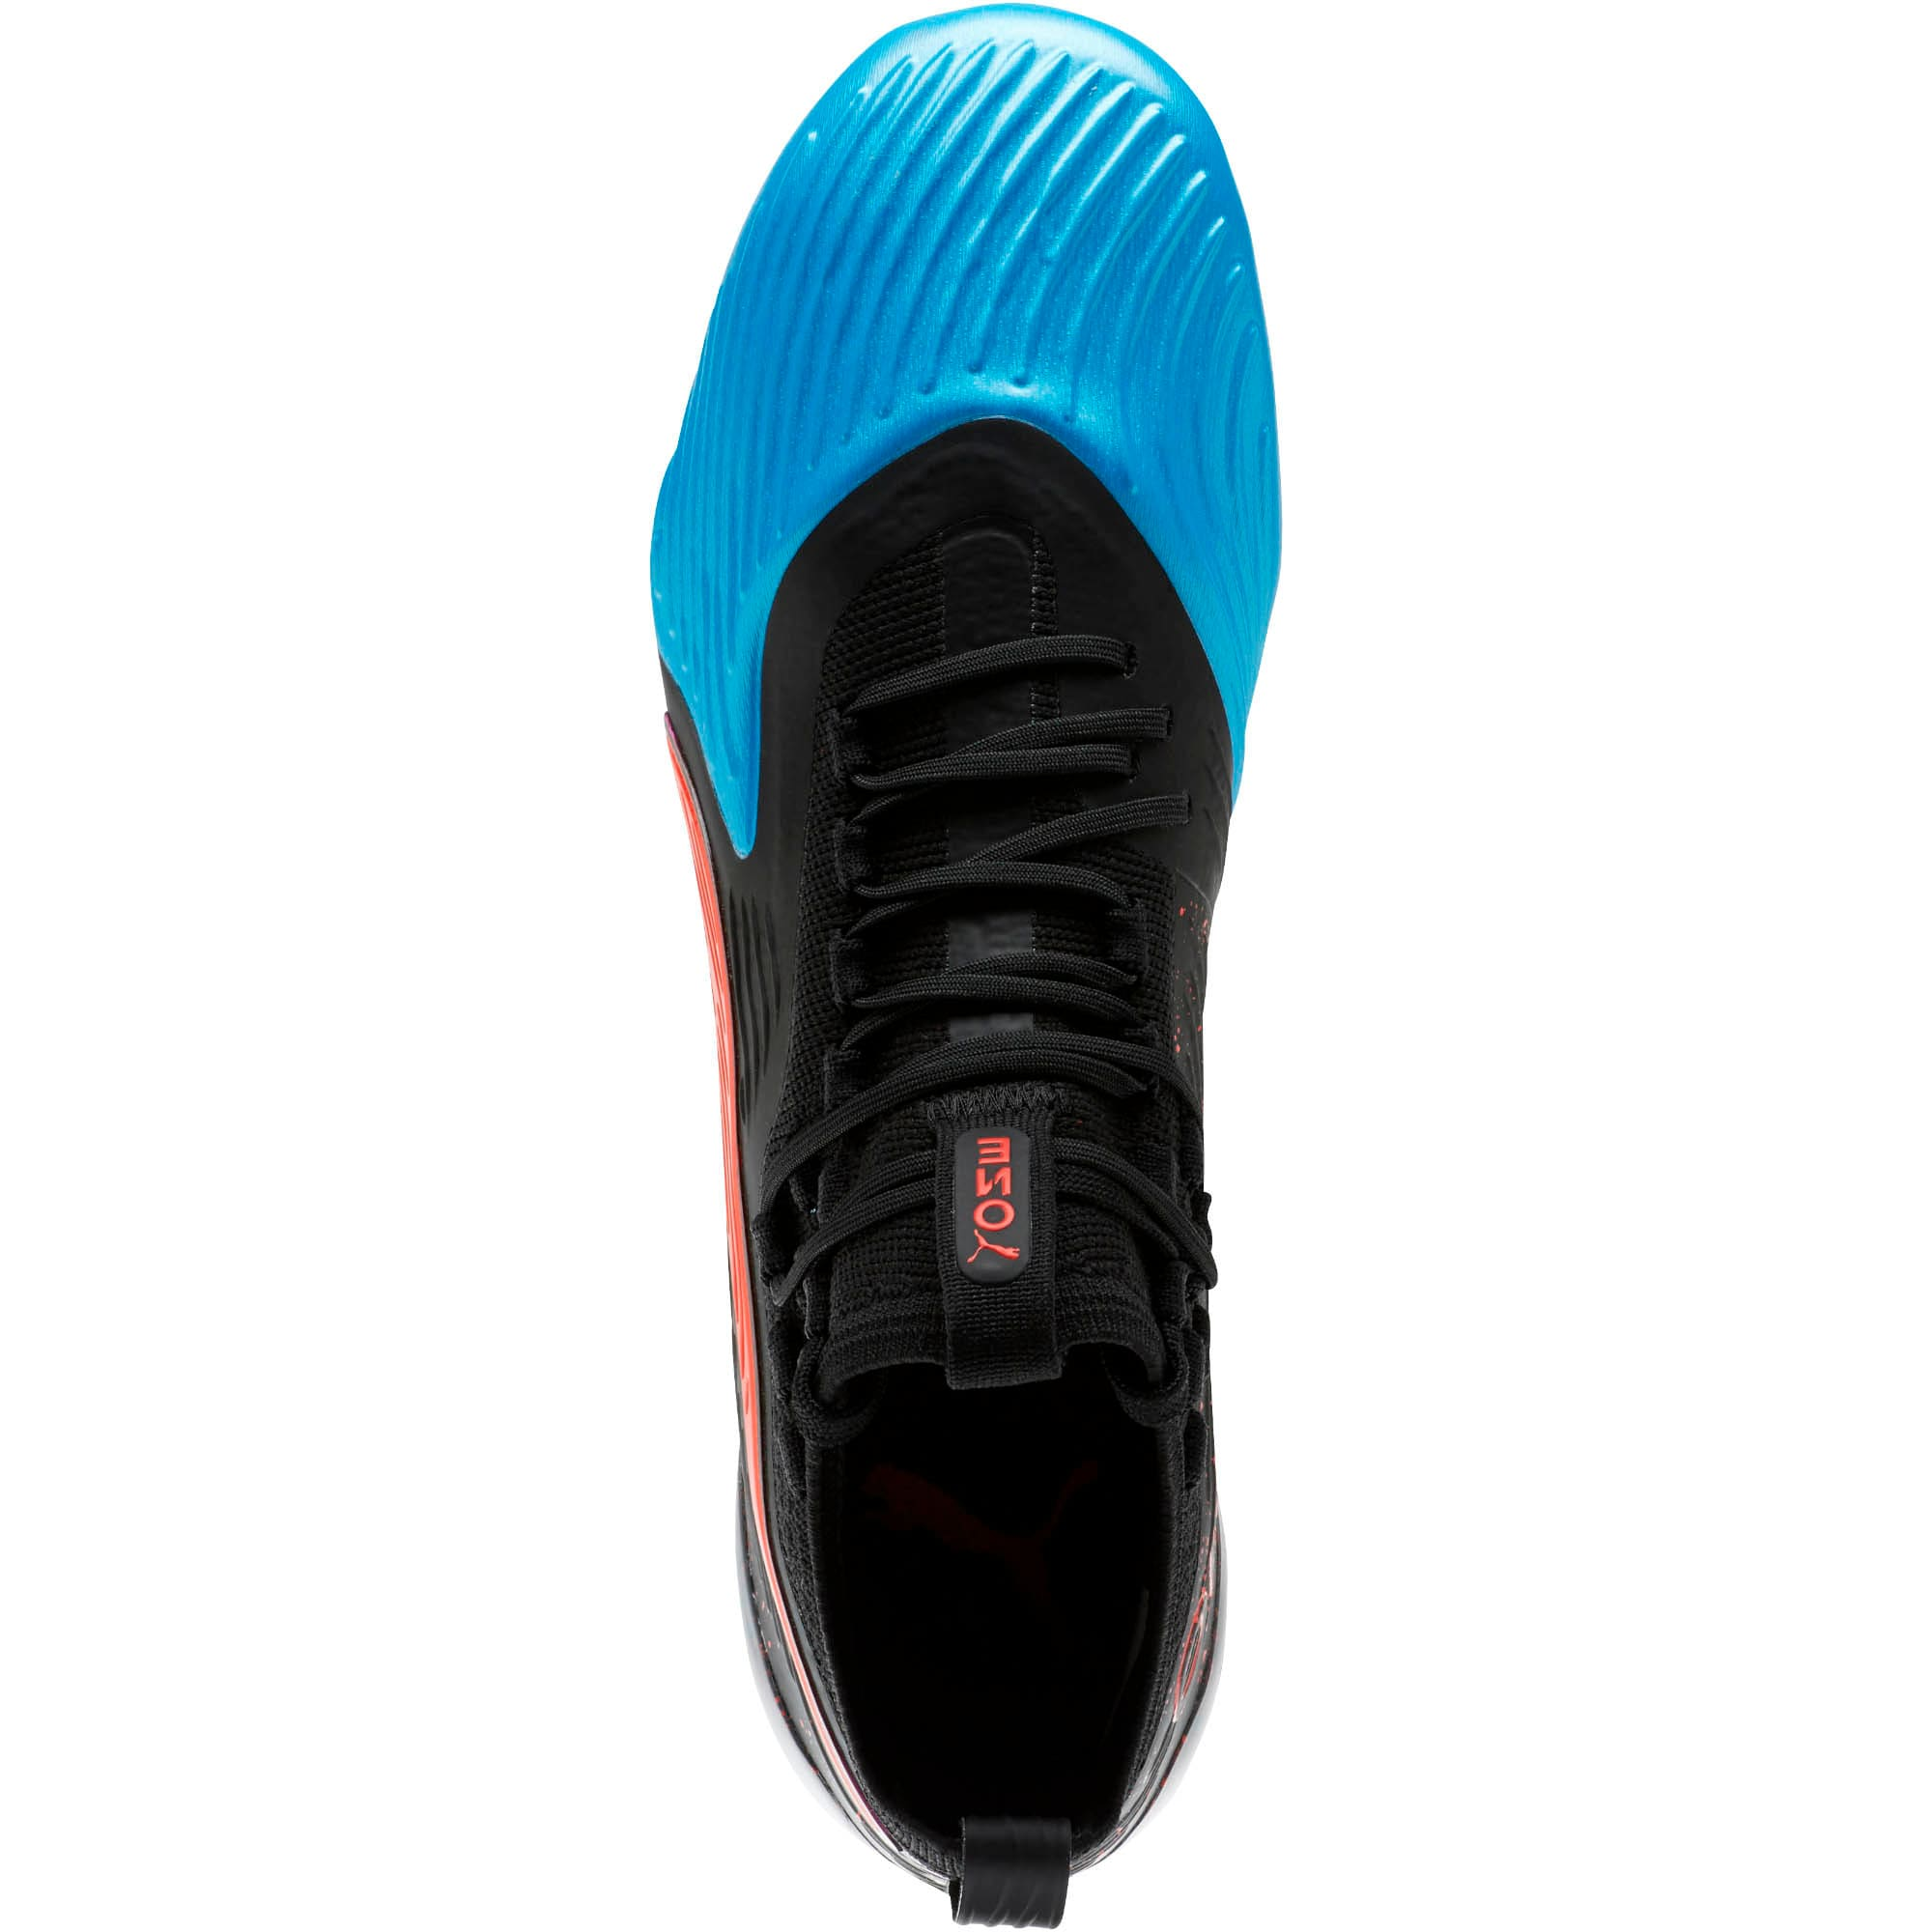 Thumbnail 5 of PUMA ONE 19.1 FG/AG Men's Soccer Cleats, Bleu Azur-Red Blast-Black, medium